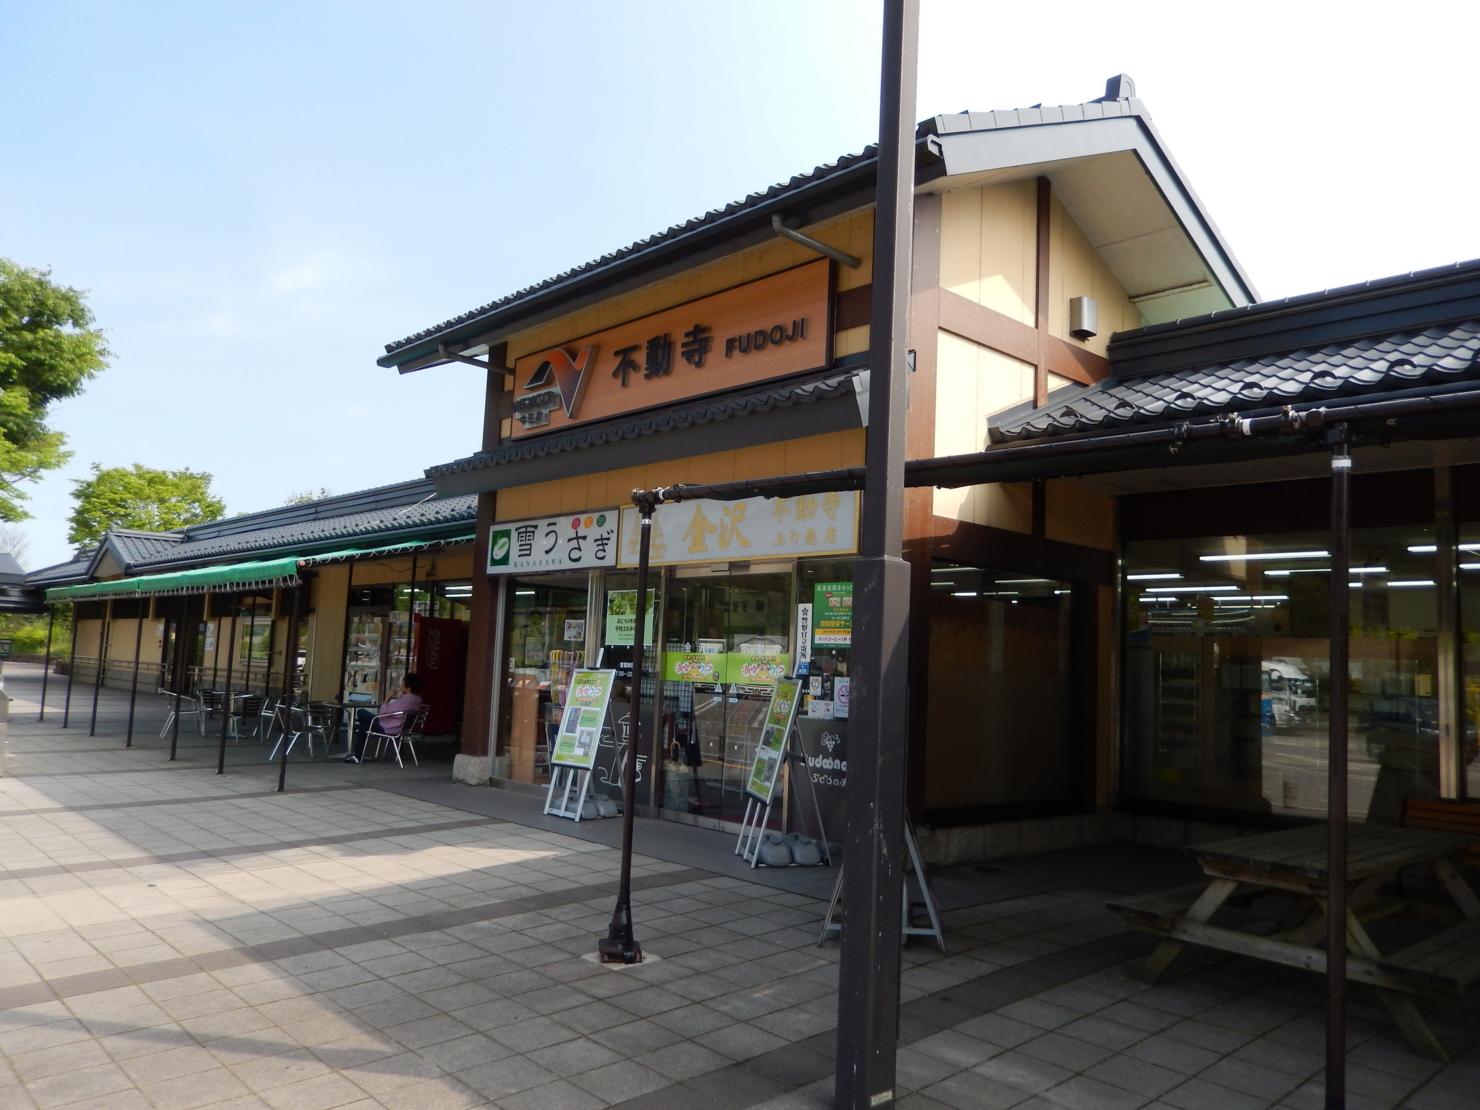 f:id:ToshUeno:20130524150808j:plain